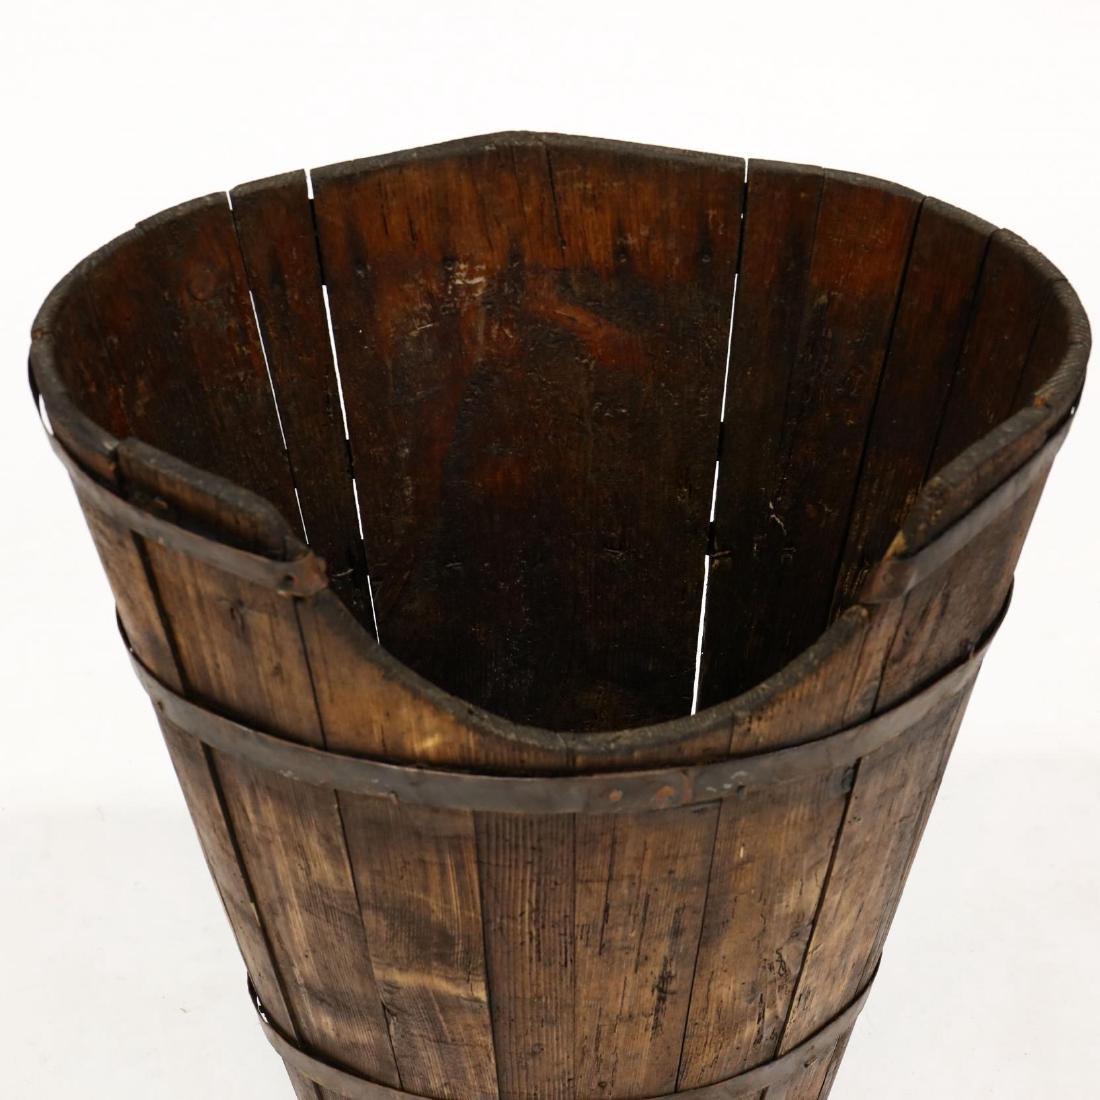 Antique French  Hotte  Grape Gathering Barrel - 3